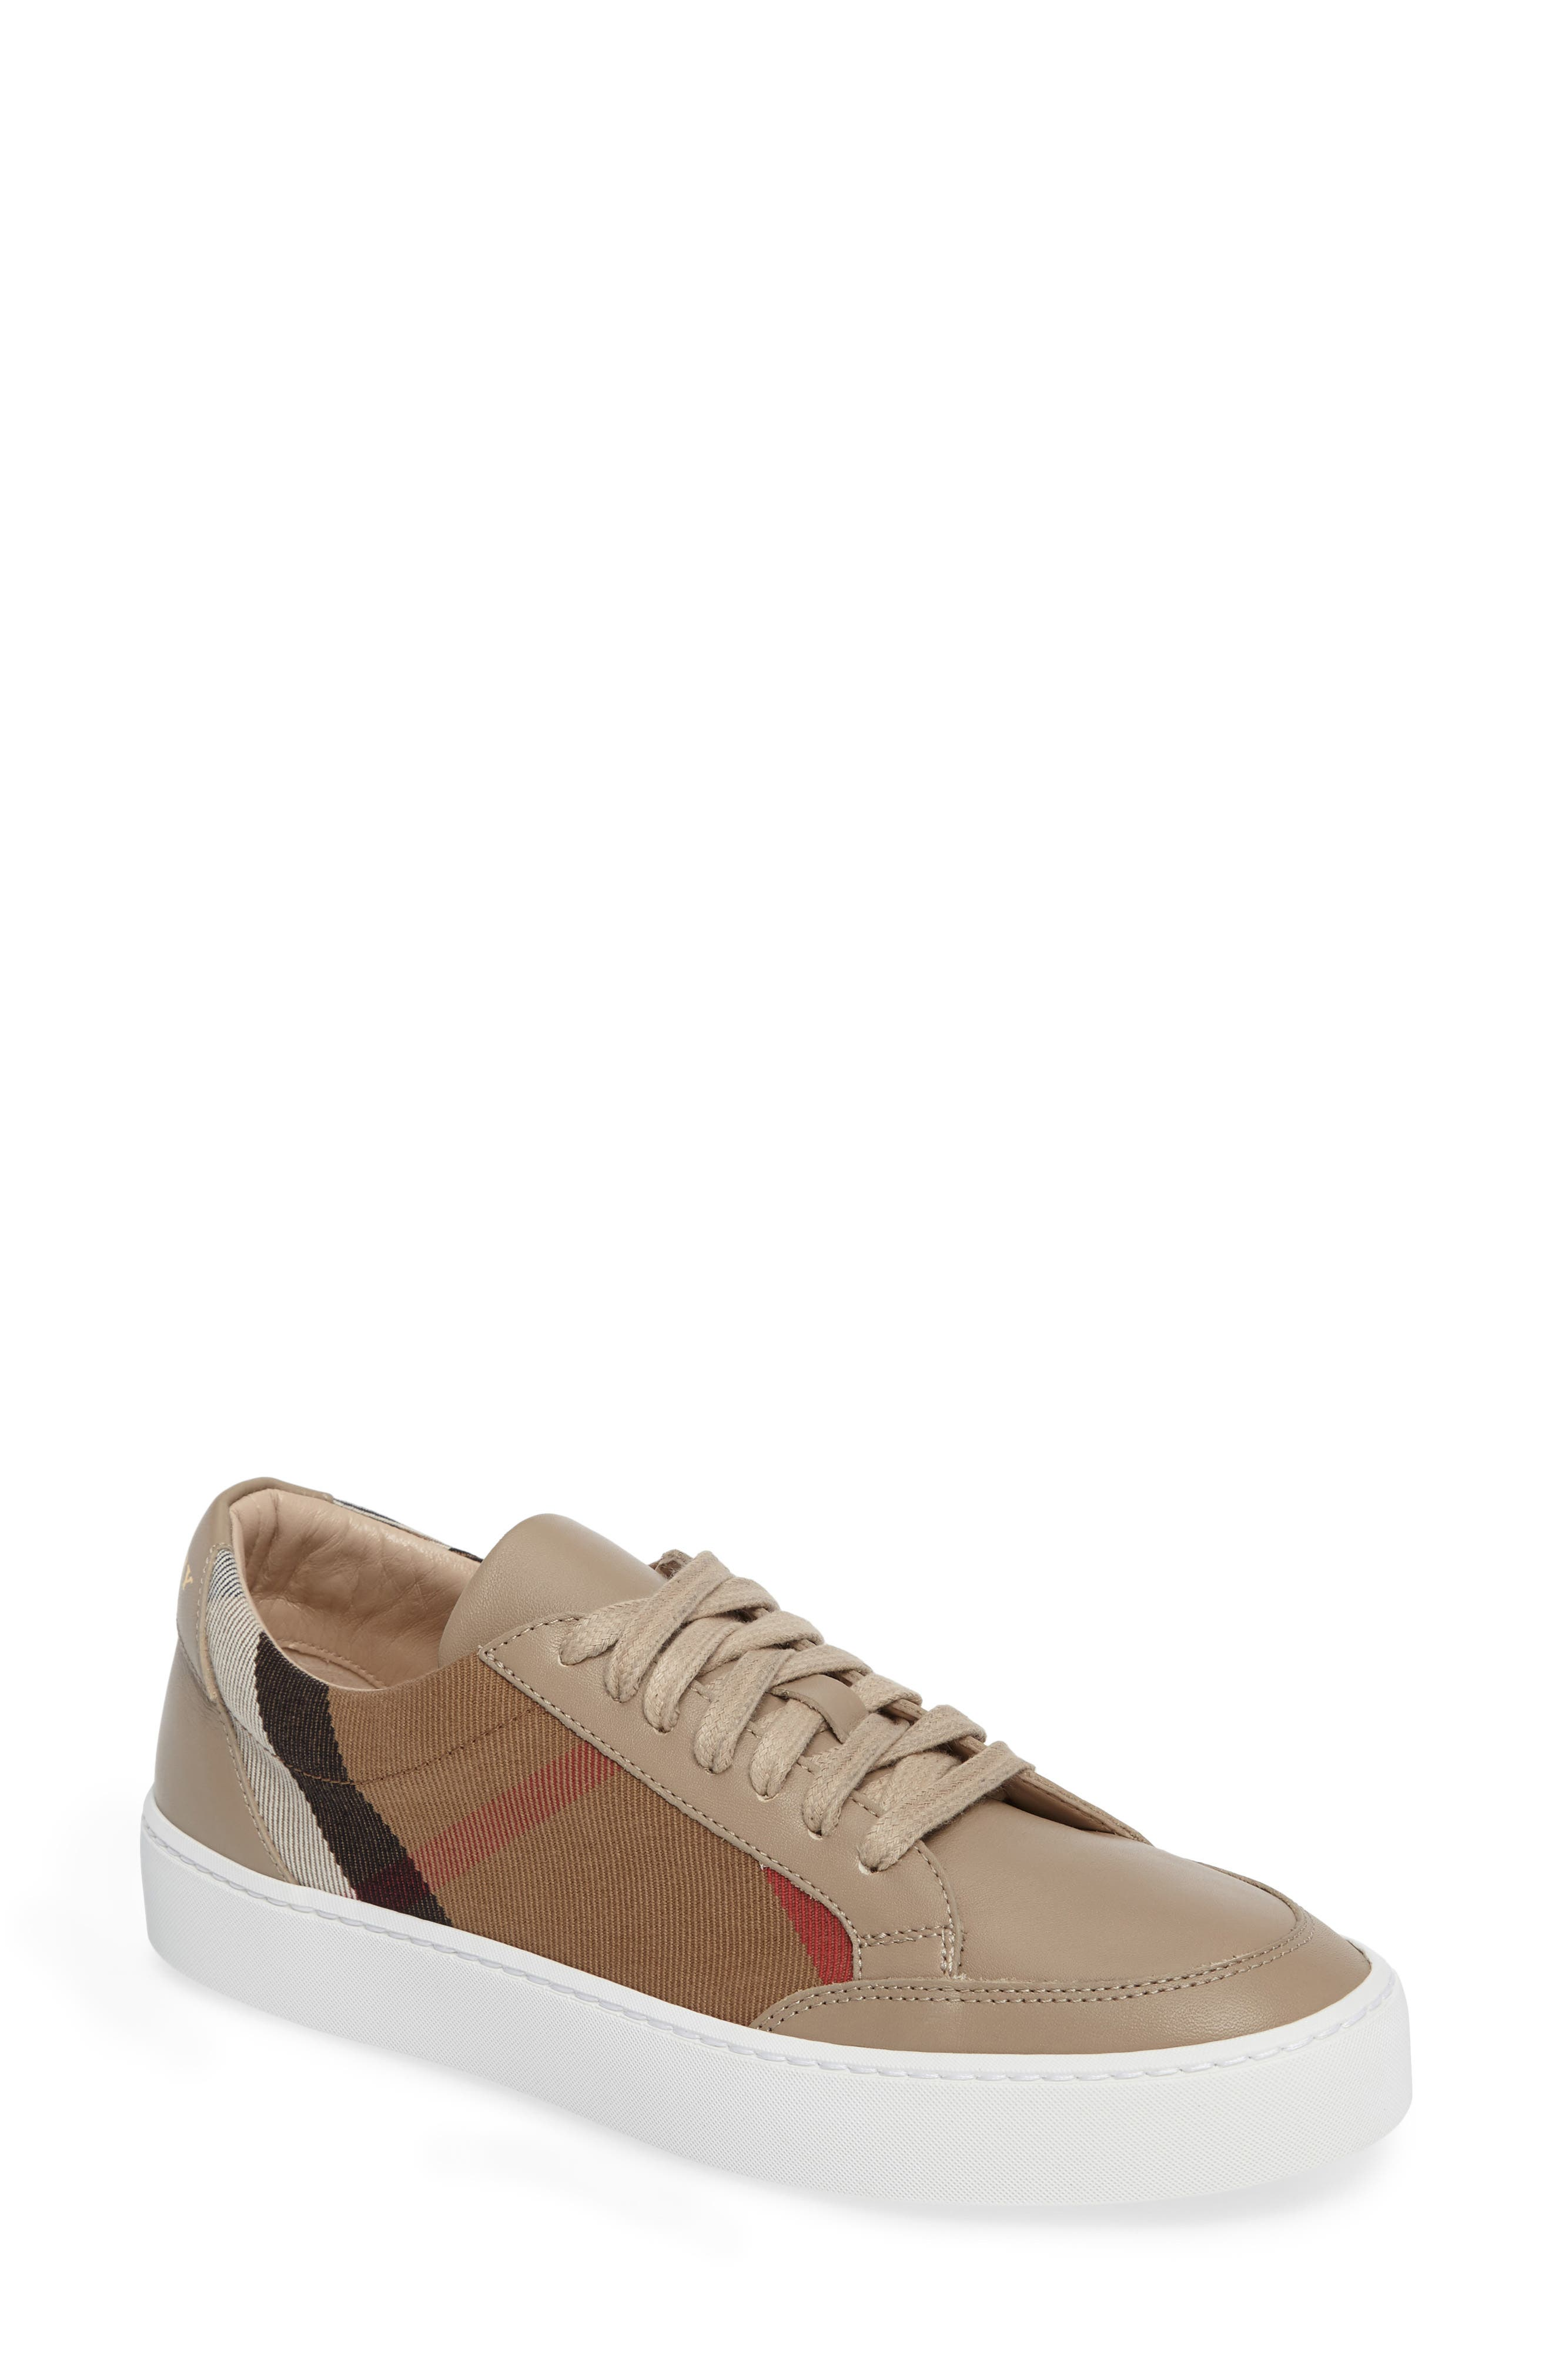 Alternate Image 1 Selected - Burberry Salmond Sneaker (Women)